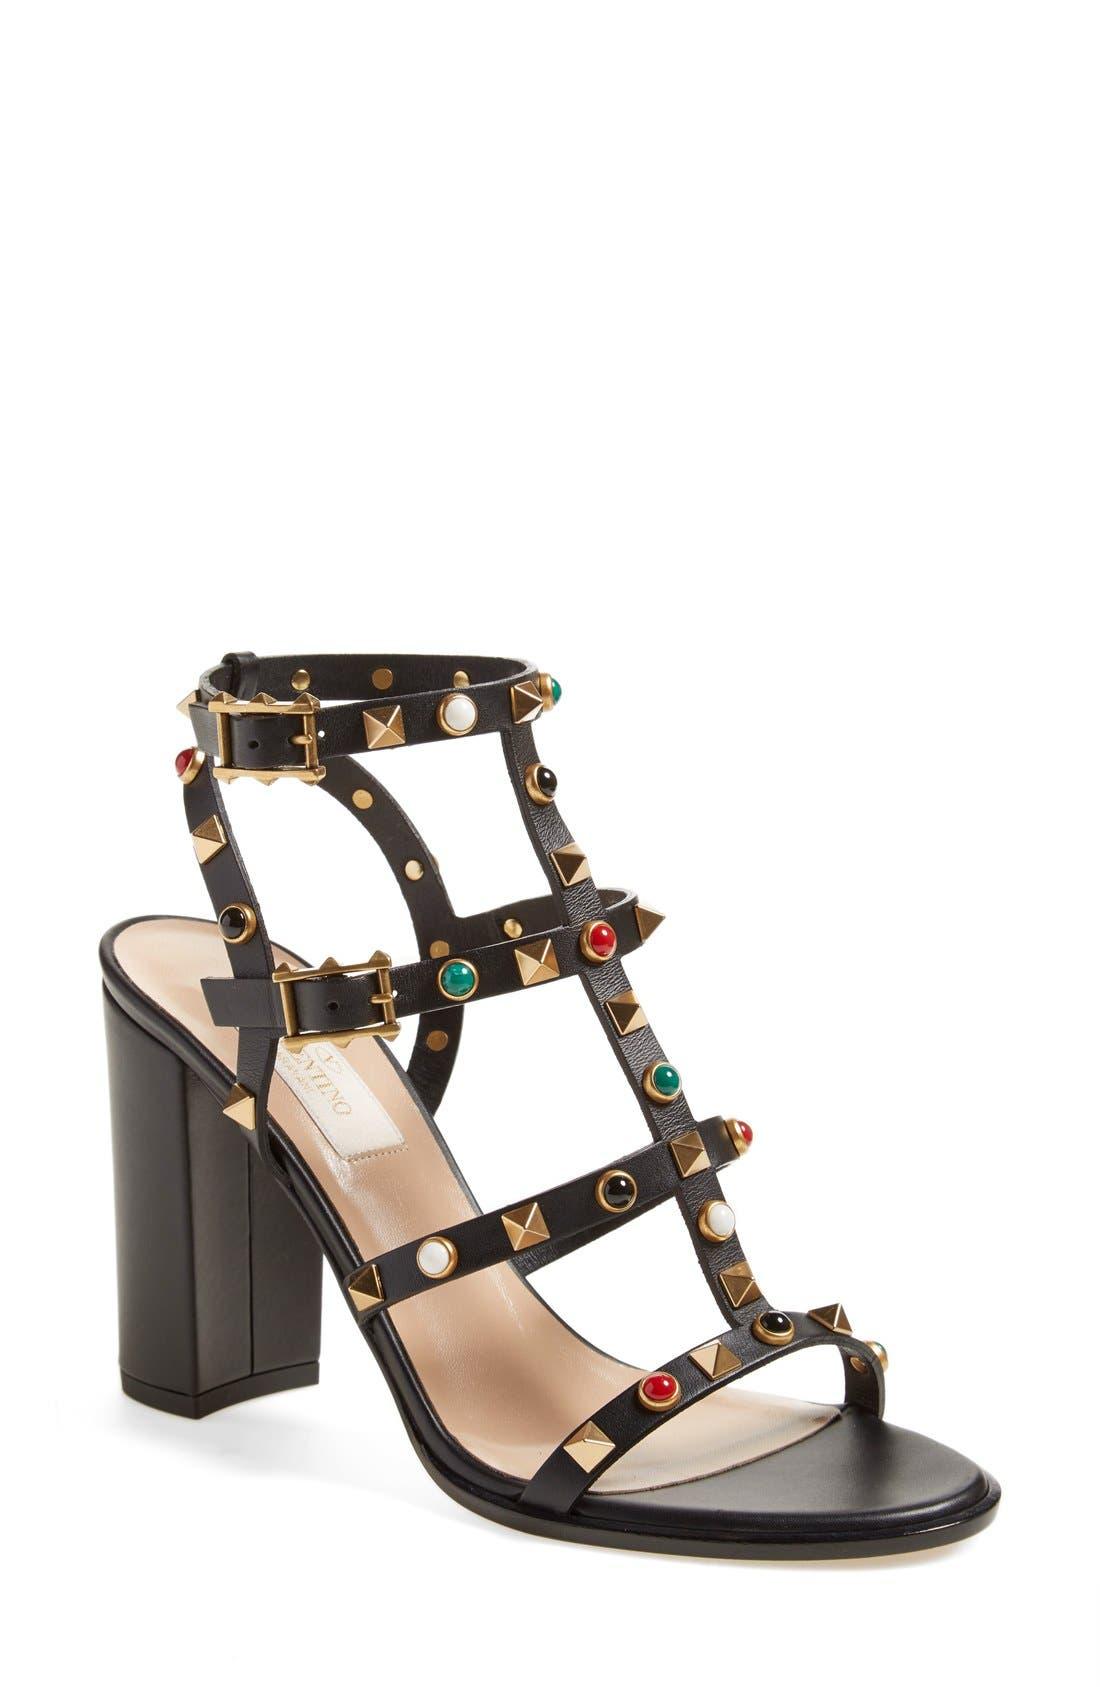 Main Image - Valentino 'Vitello' Studded Sandal (Women)